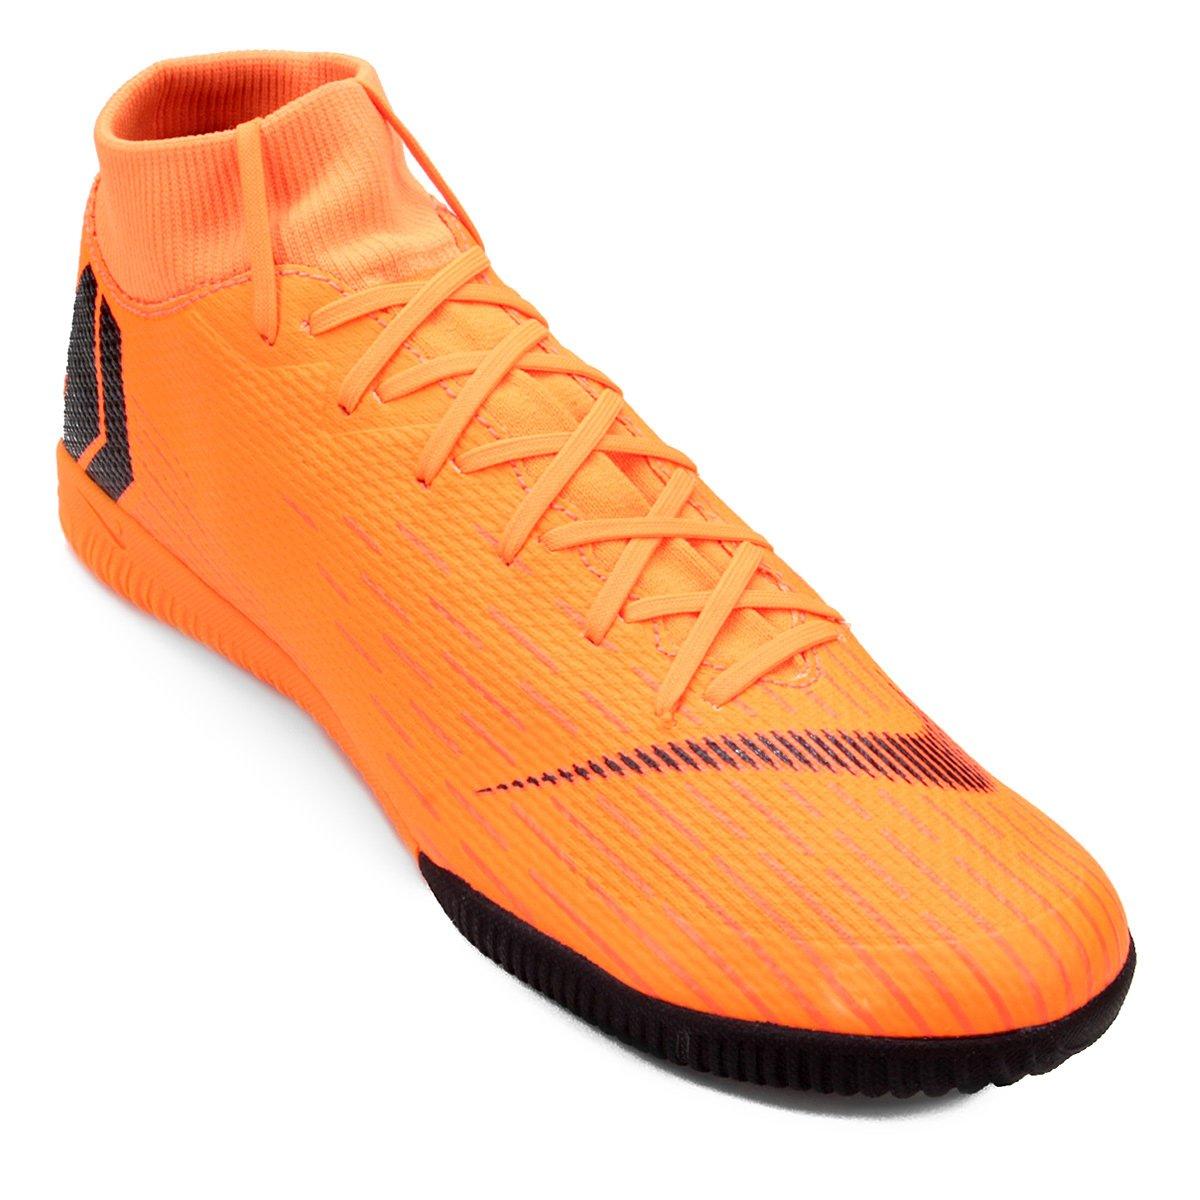 50bddf2c22 Chuteira Futsal Nike Mercurial Superfly 6 Academy - Laranja e Preto -  Compre Agora